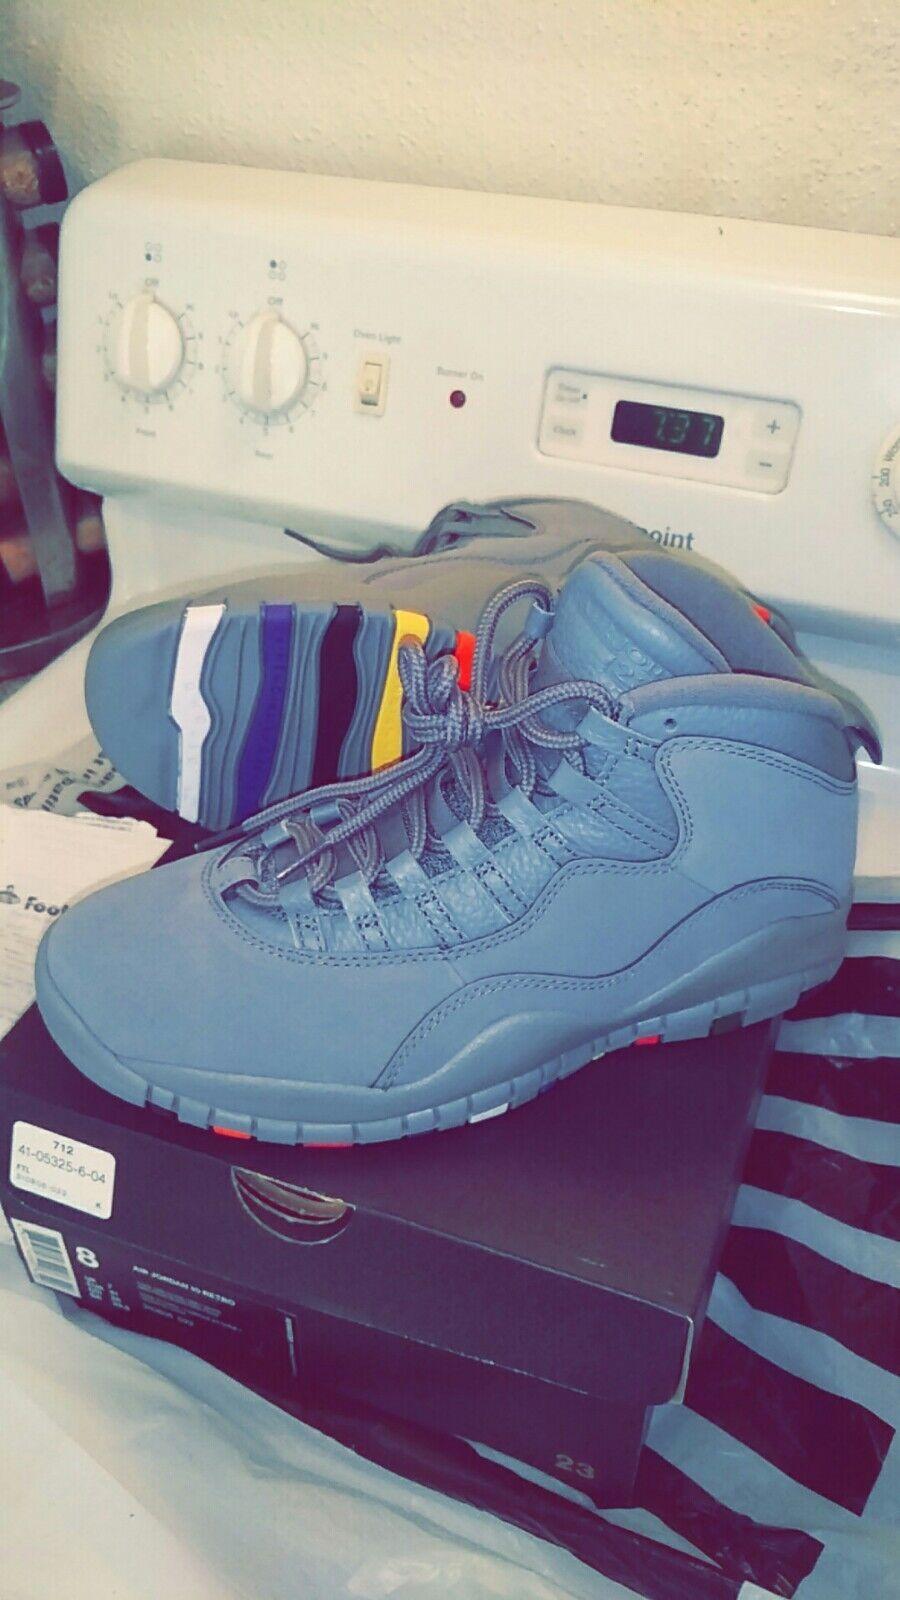 Nike air Jordan retro 10 cool grey size 8 brand new with receipt